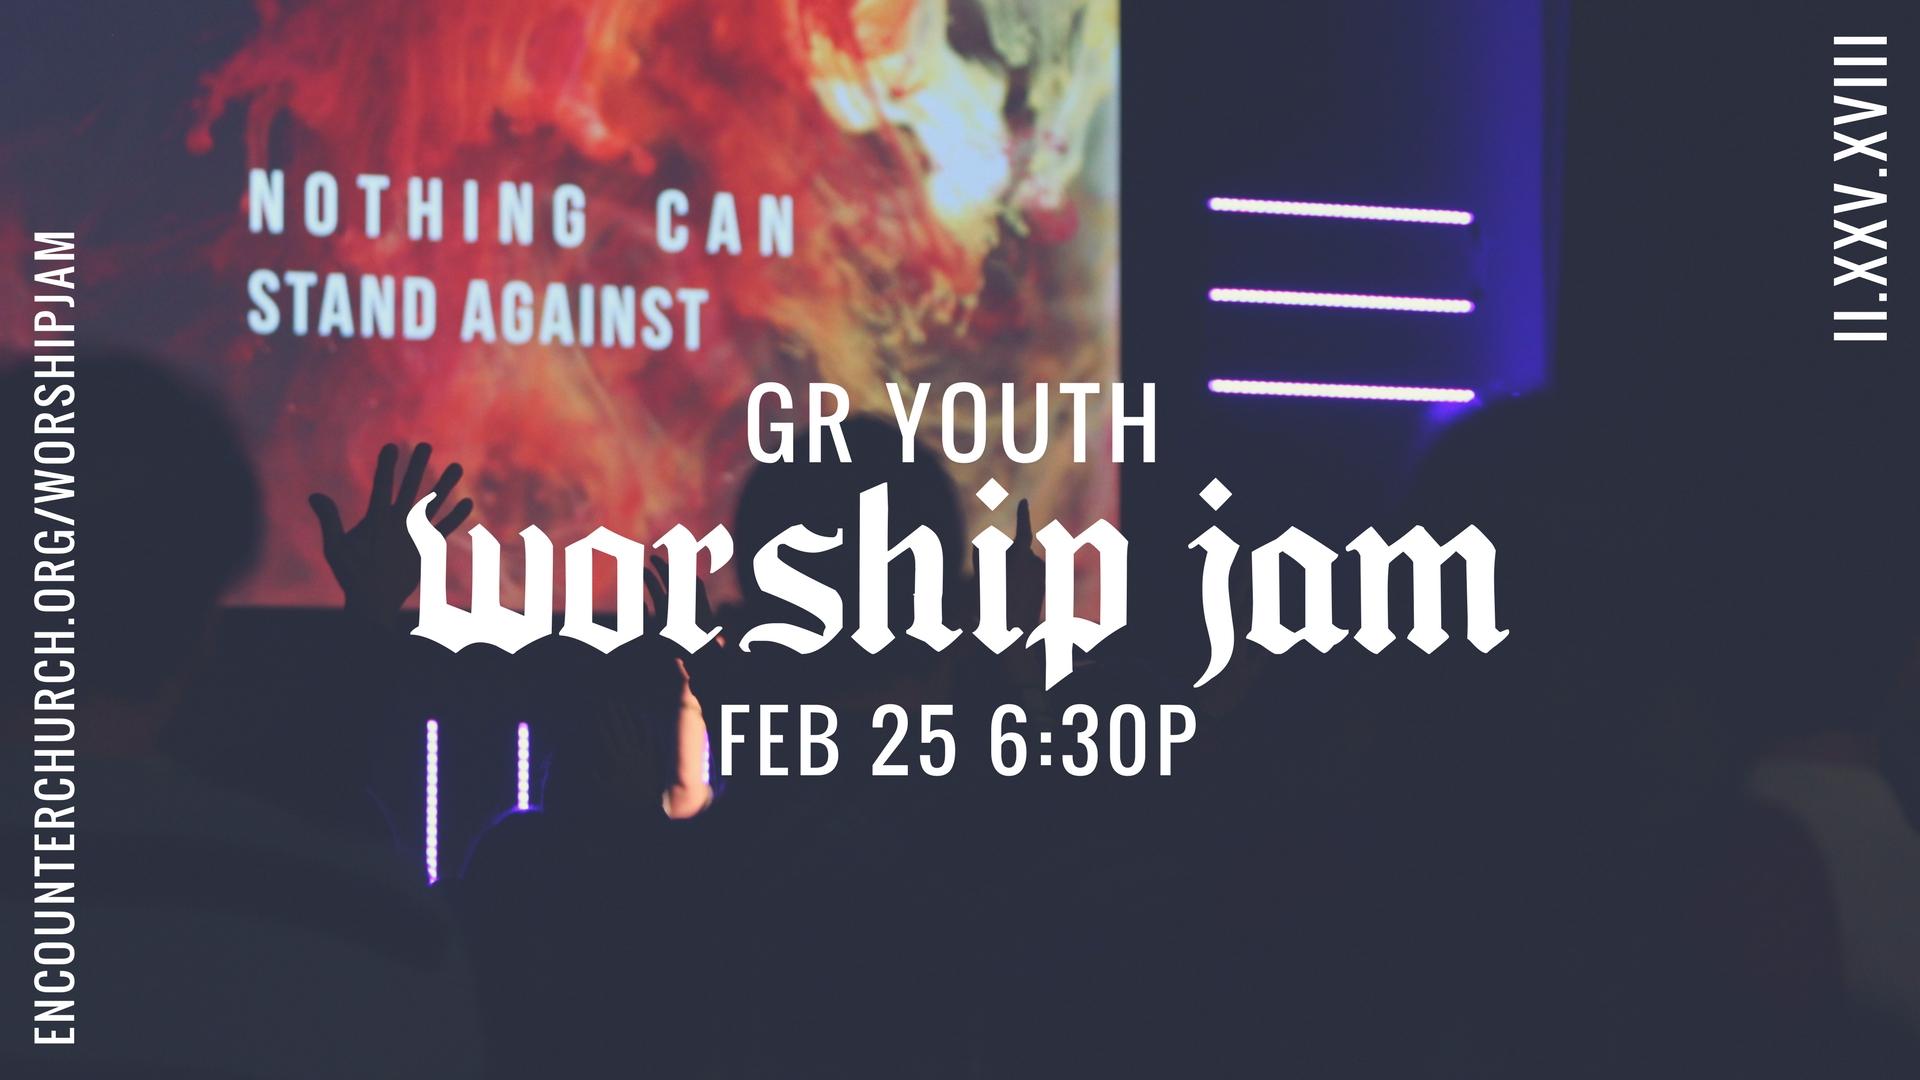 Worship jam 2018